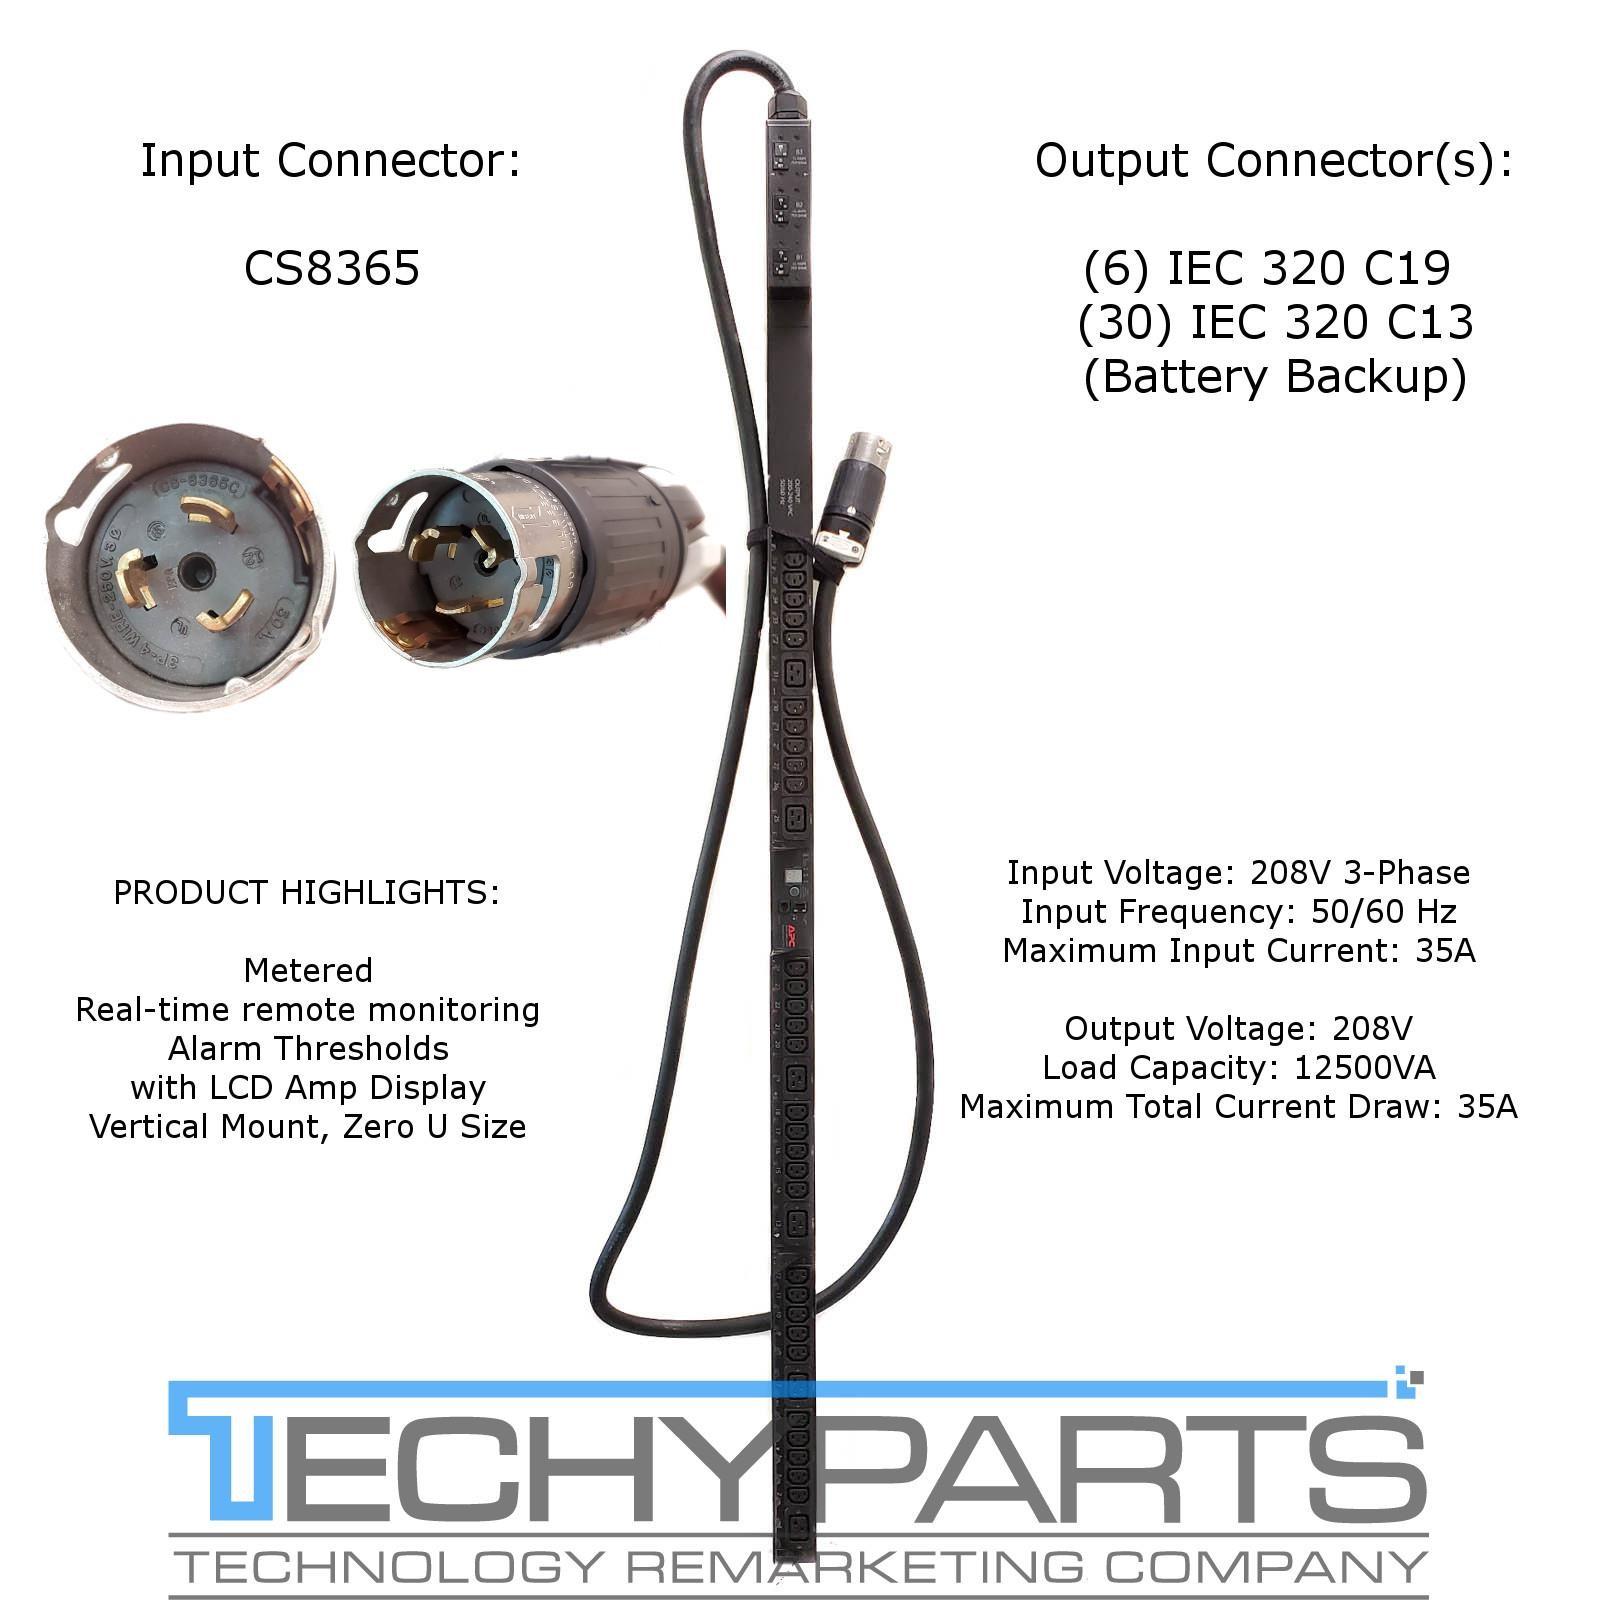 12.5kW C13, APC AP7898 Rack PDU Metered Zero U 6 30 C19 ~ 10/' Cord 208V,